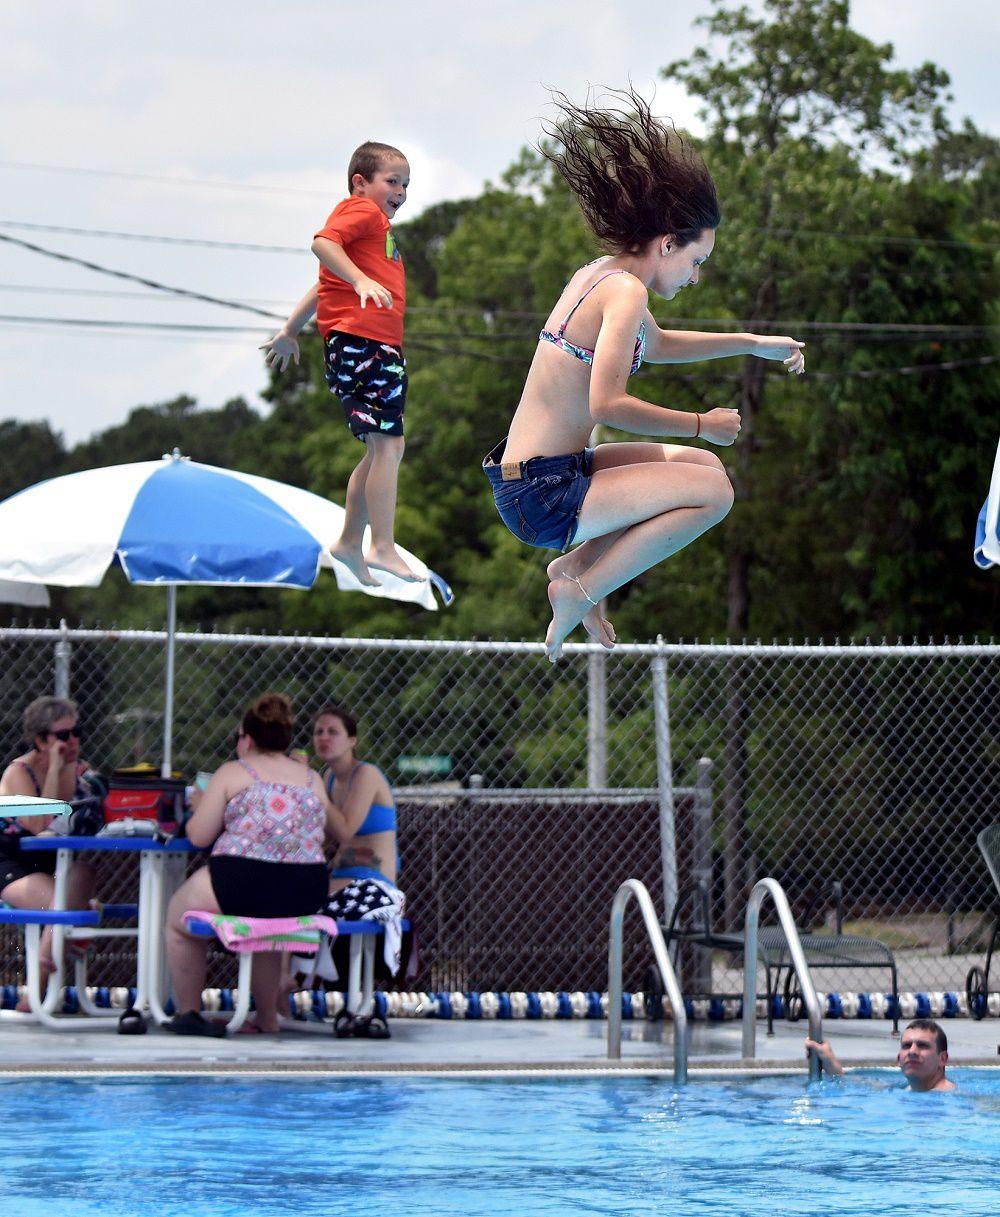 Swimming pool 2 pair jumps in.jpg